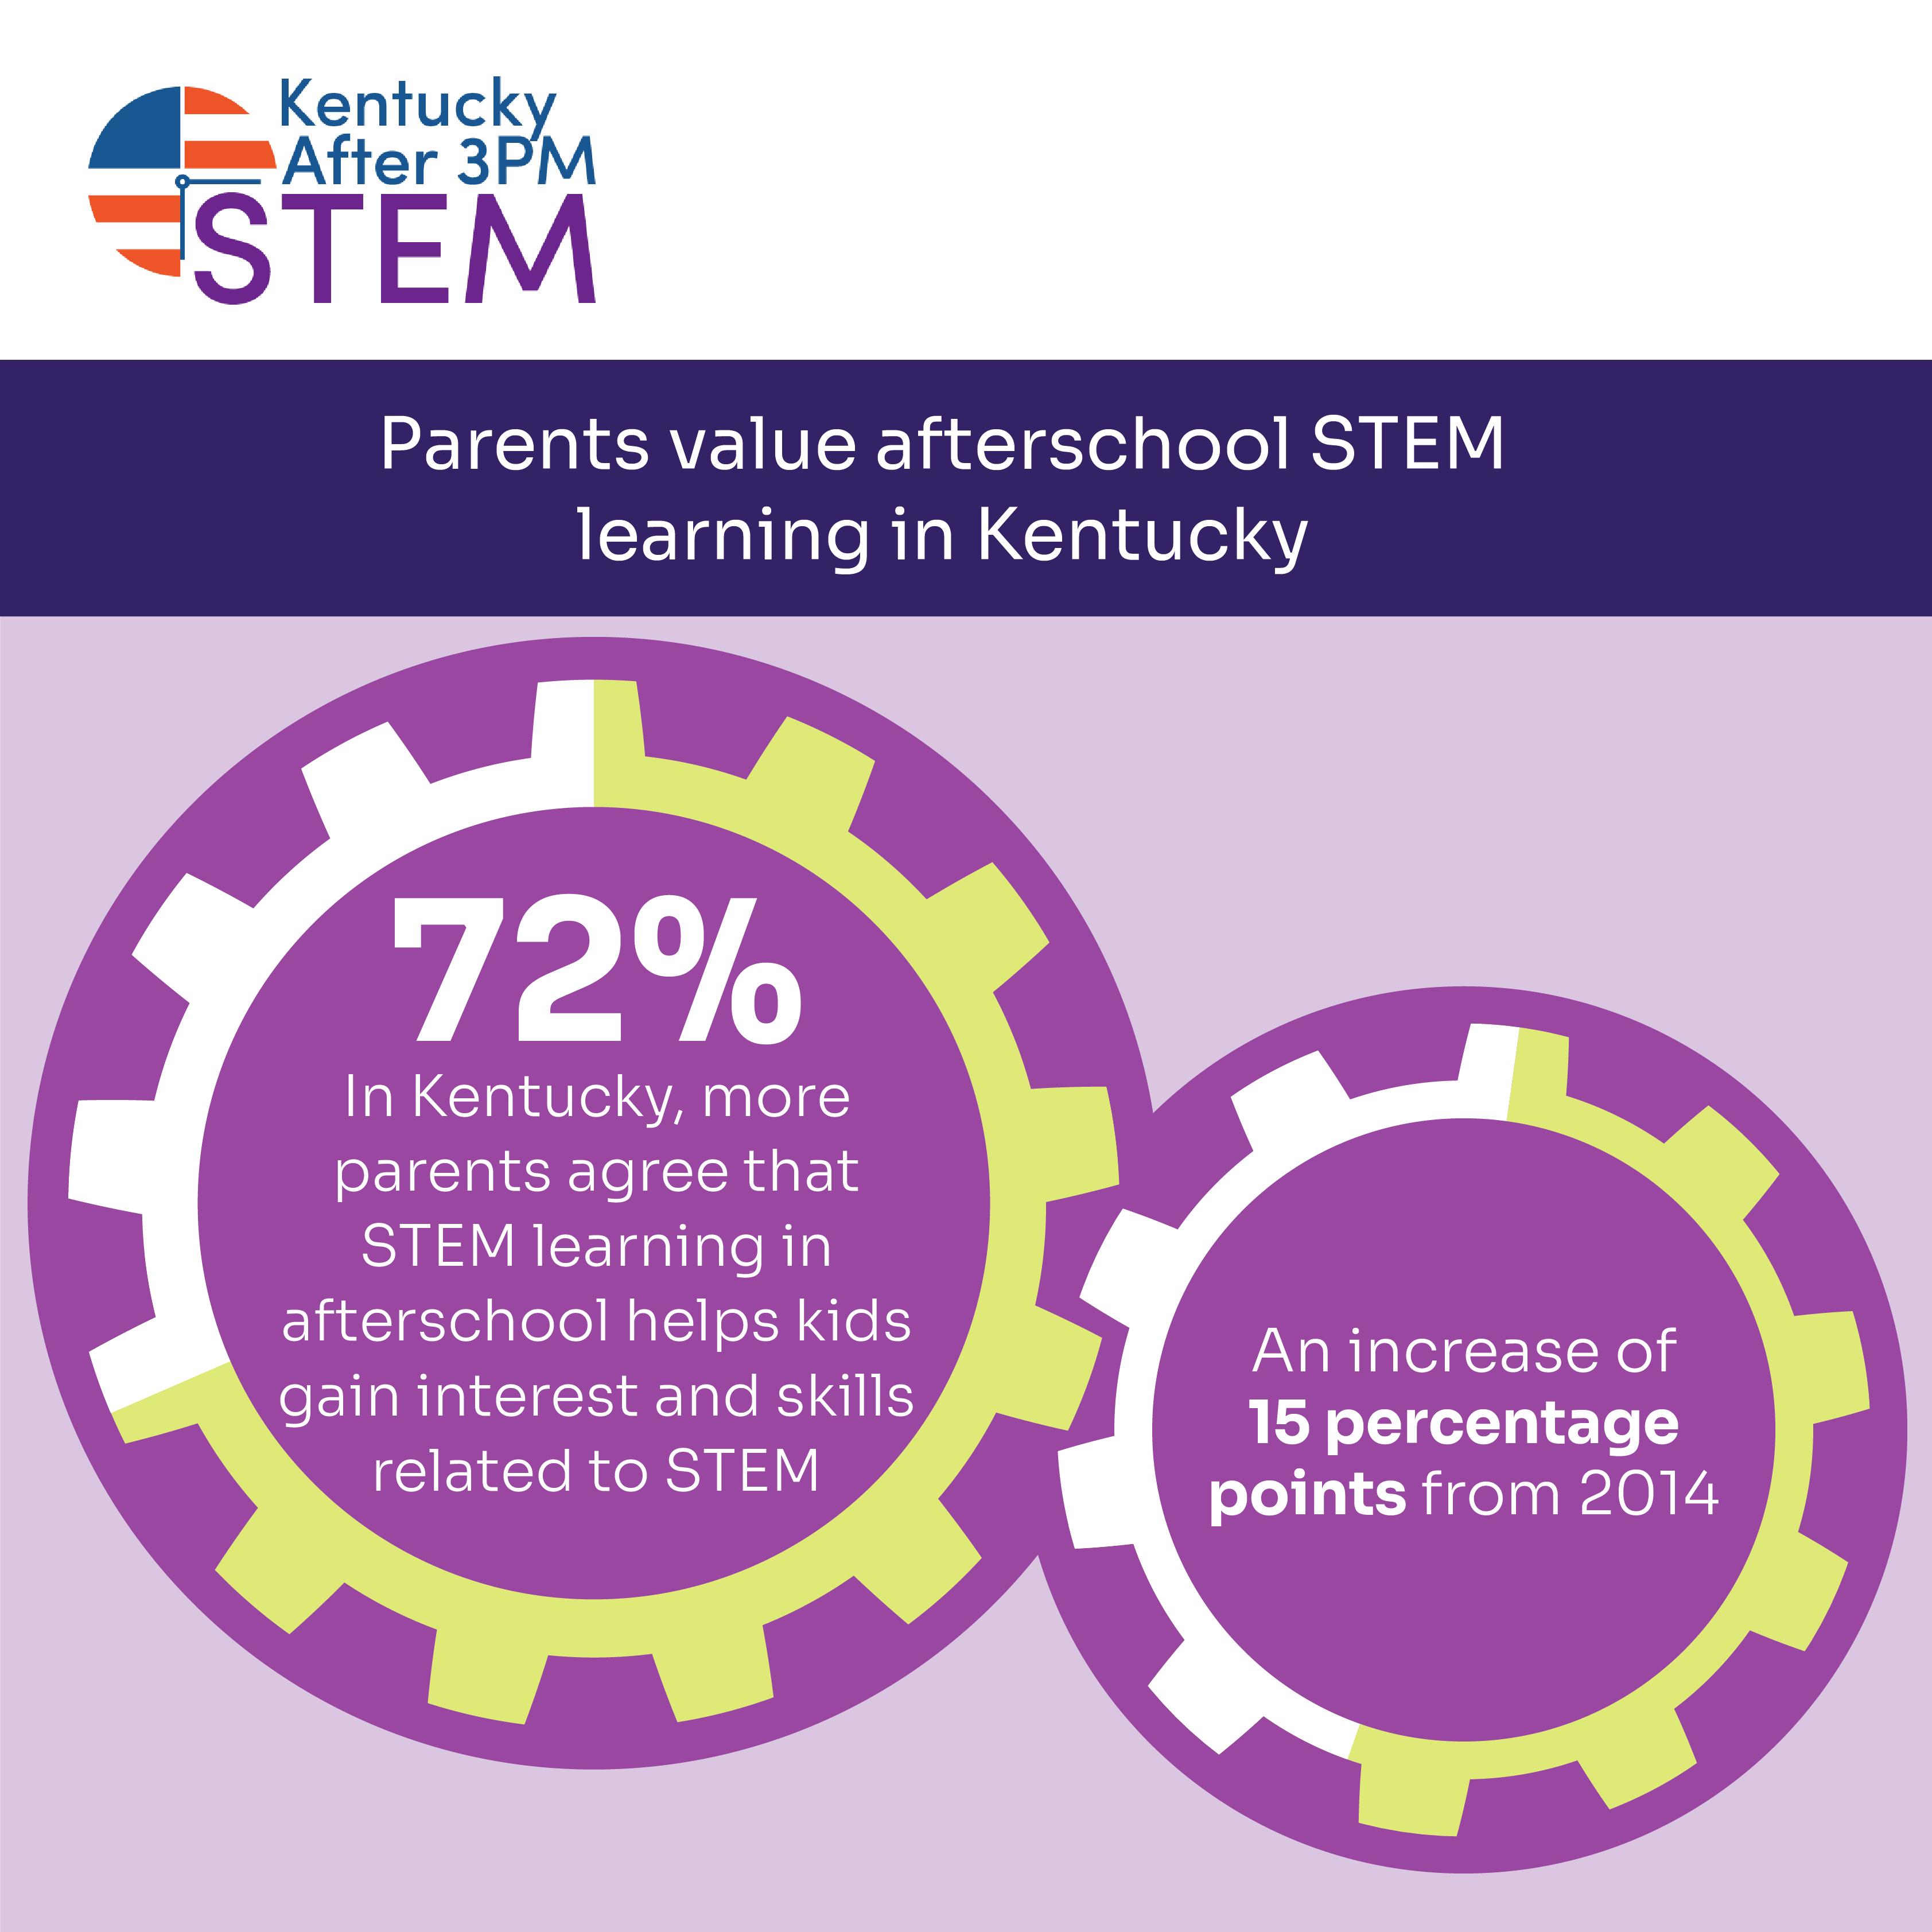 STEMSocialGraphics Kentucky KY ParentsValueSTEM